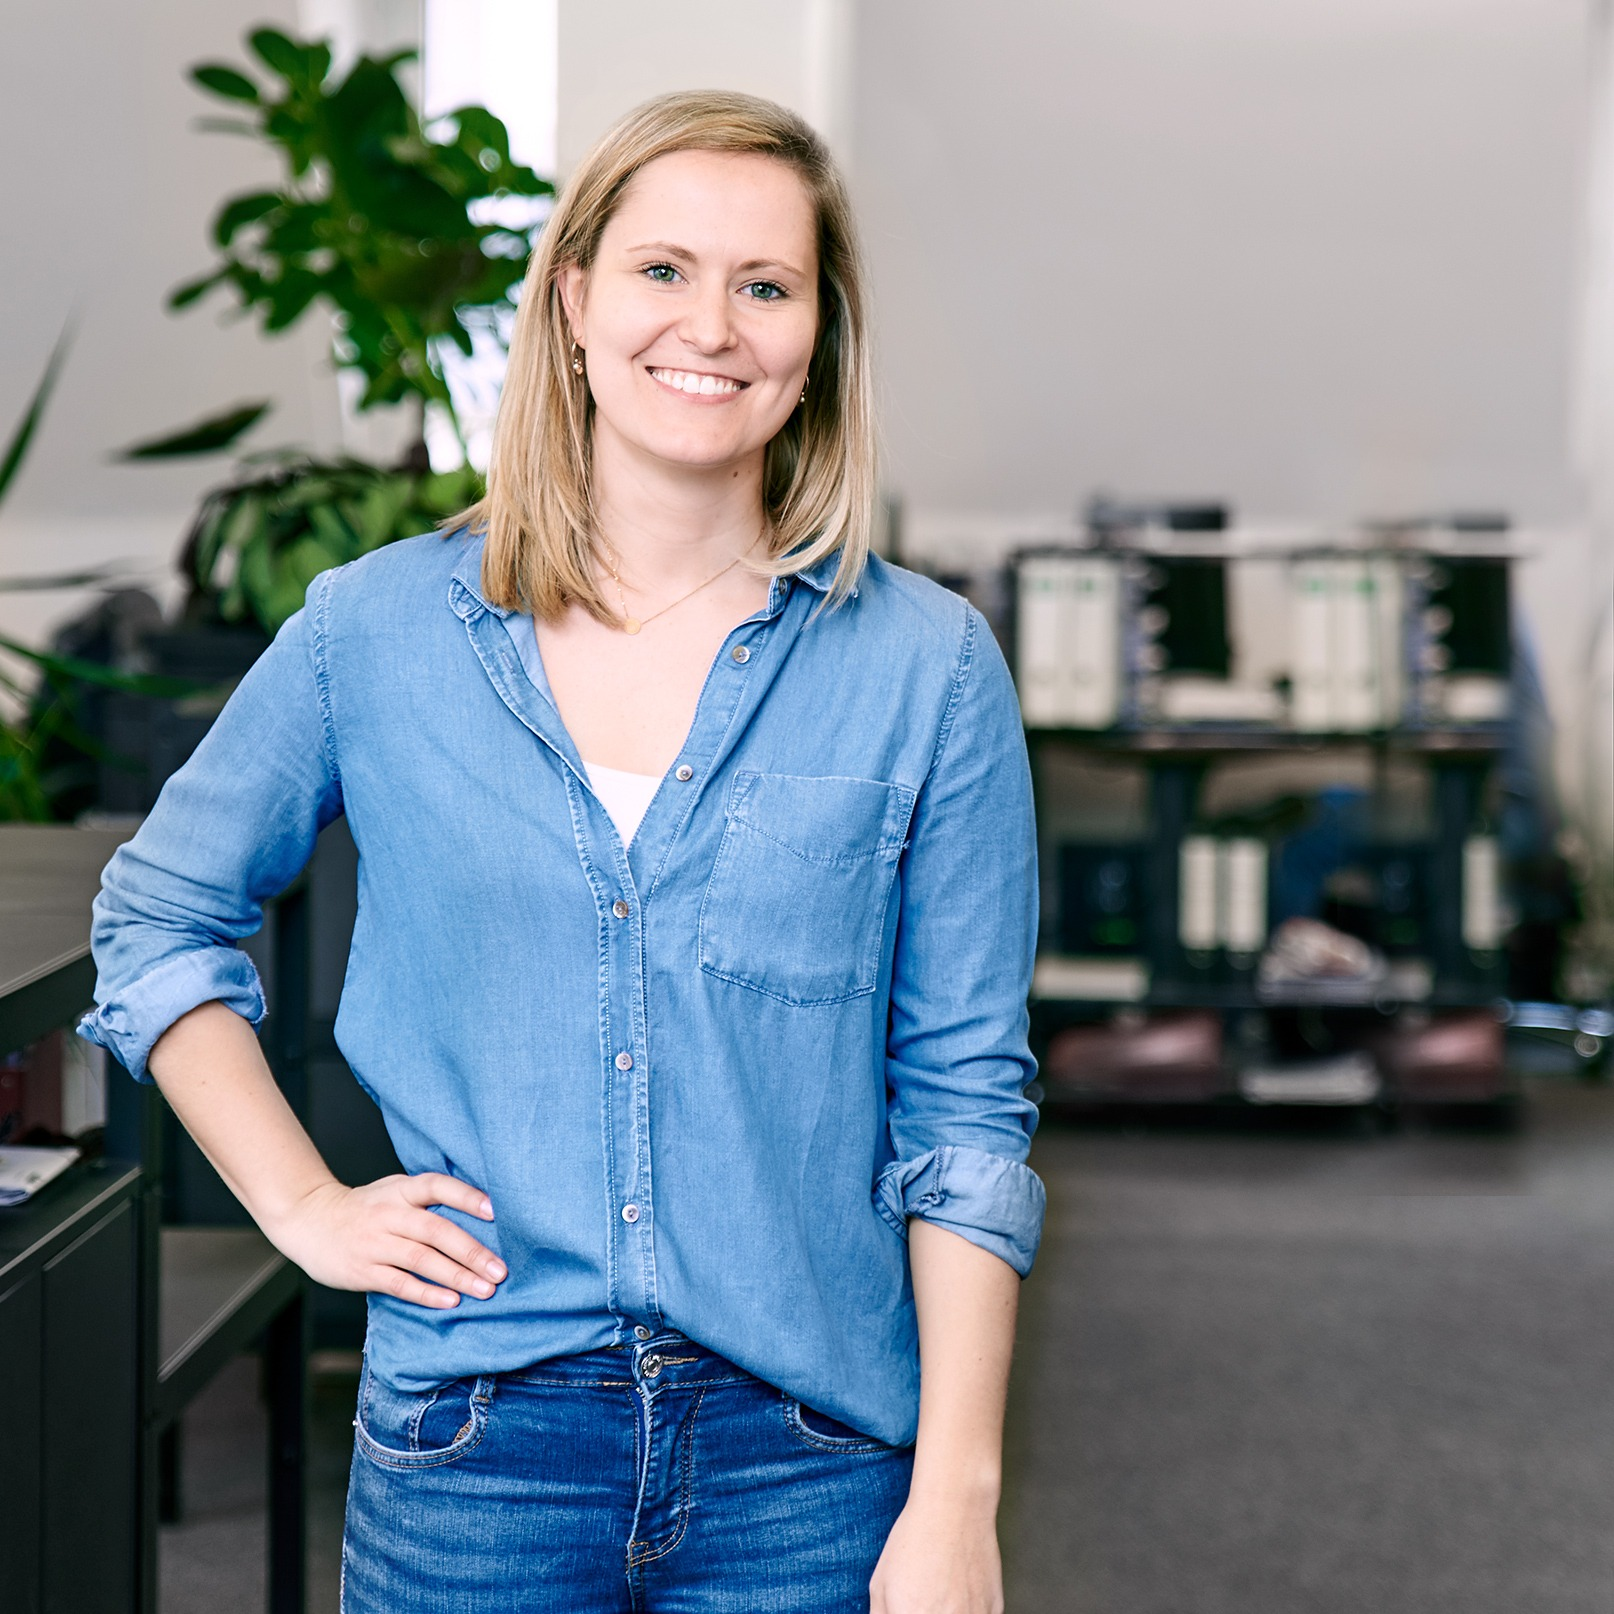 Portraitfotografie Businessfotografie straubmuellerstudios Frau ganz